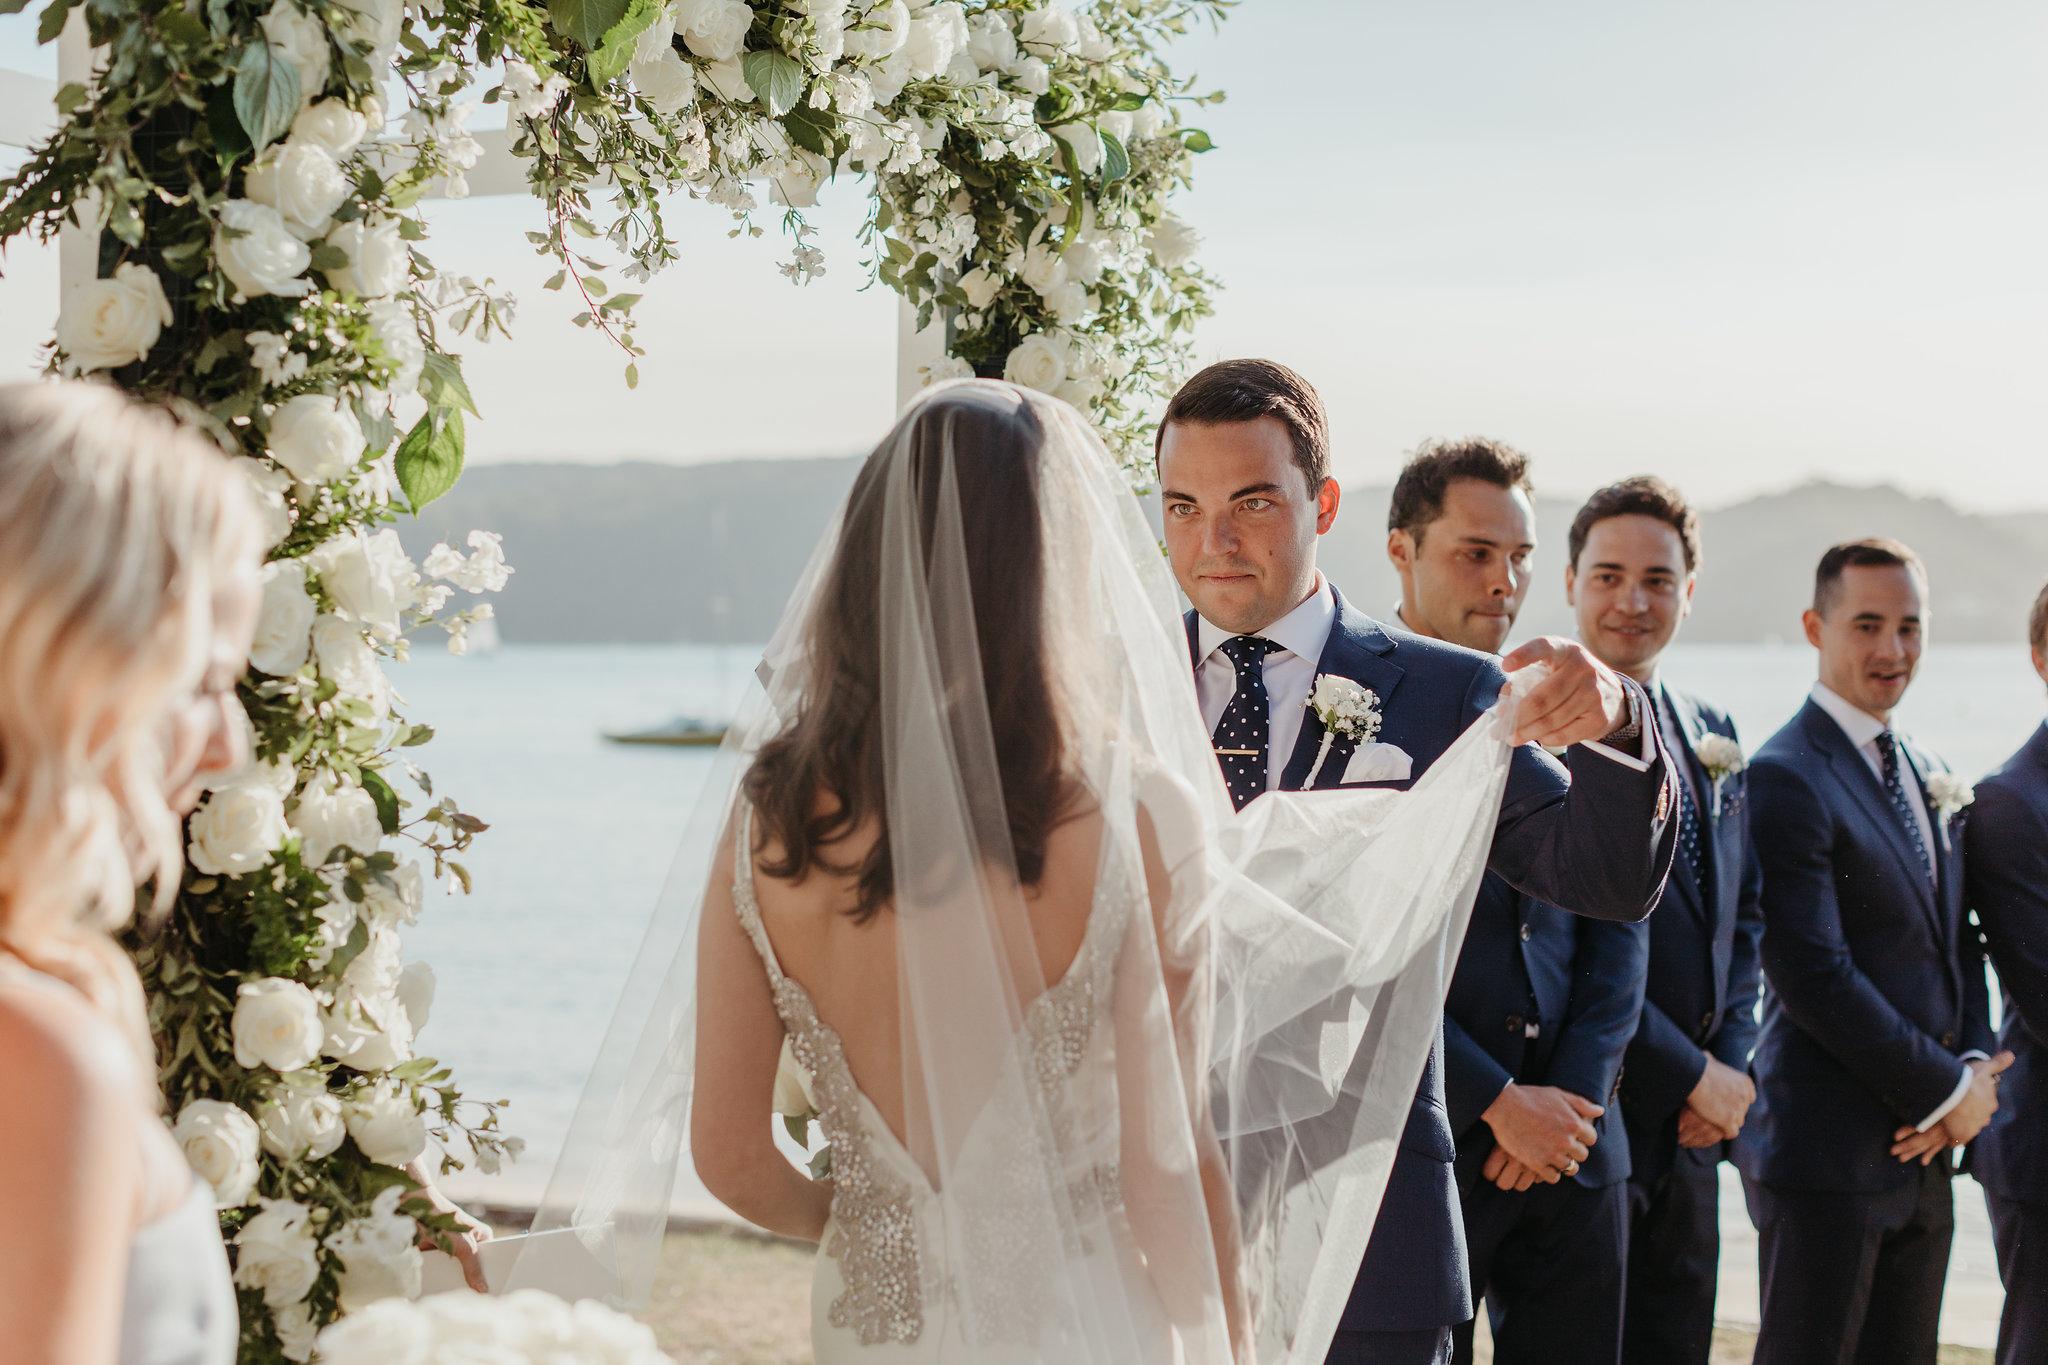 gen_chris_story_of_us_wedding-0250.JPG